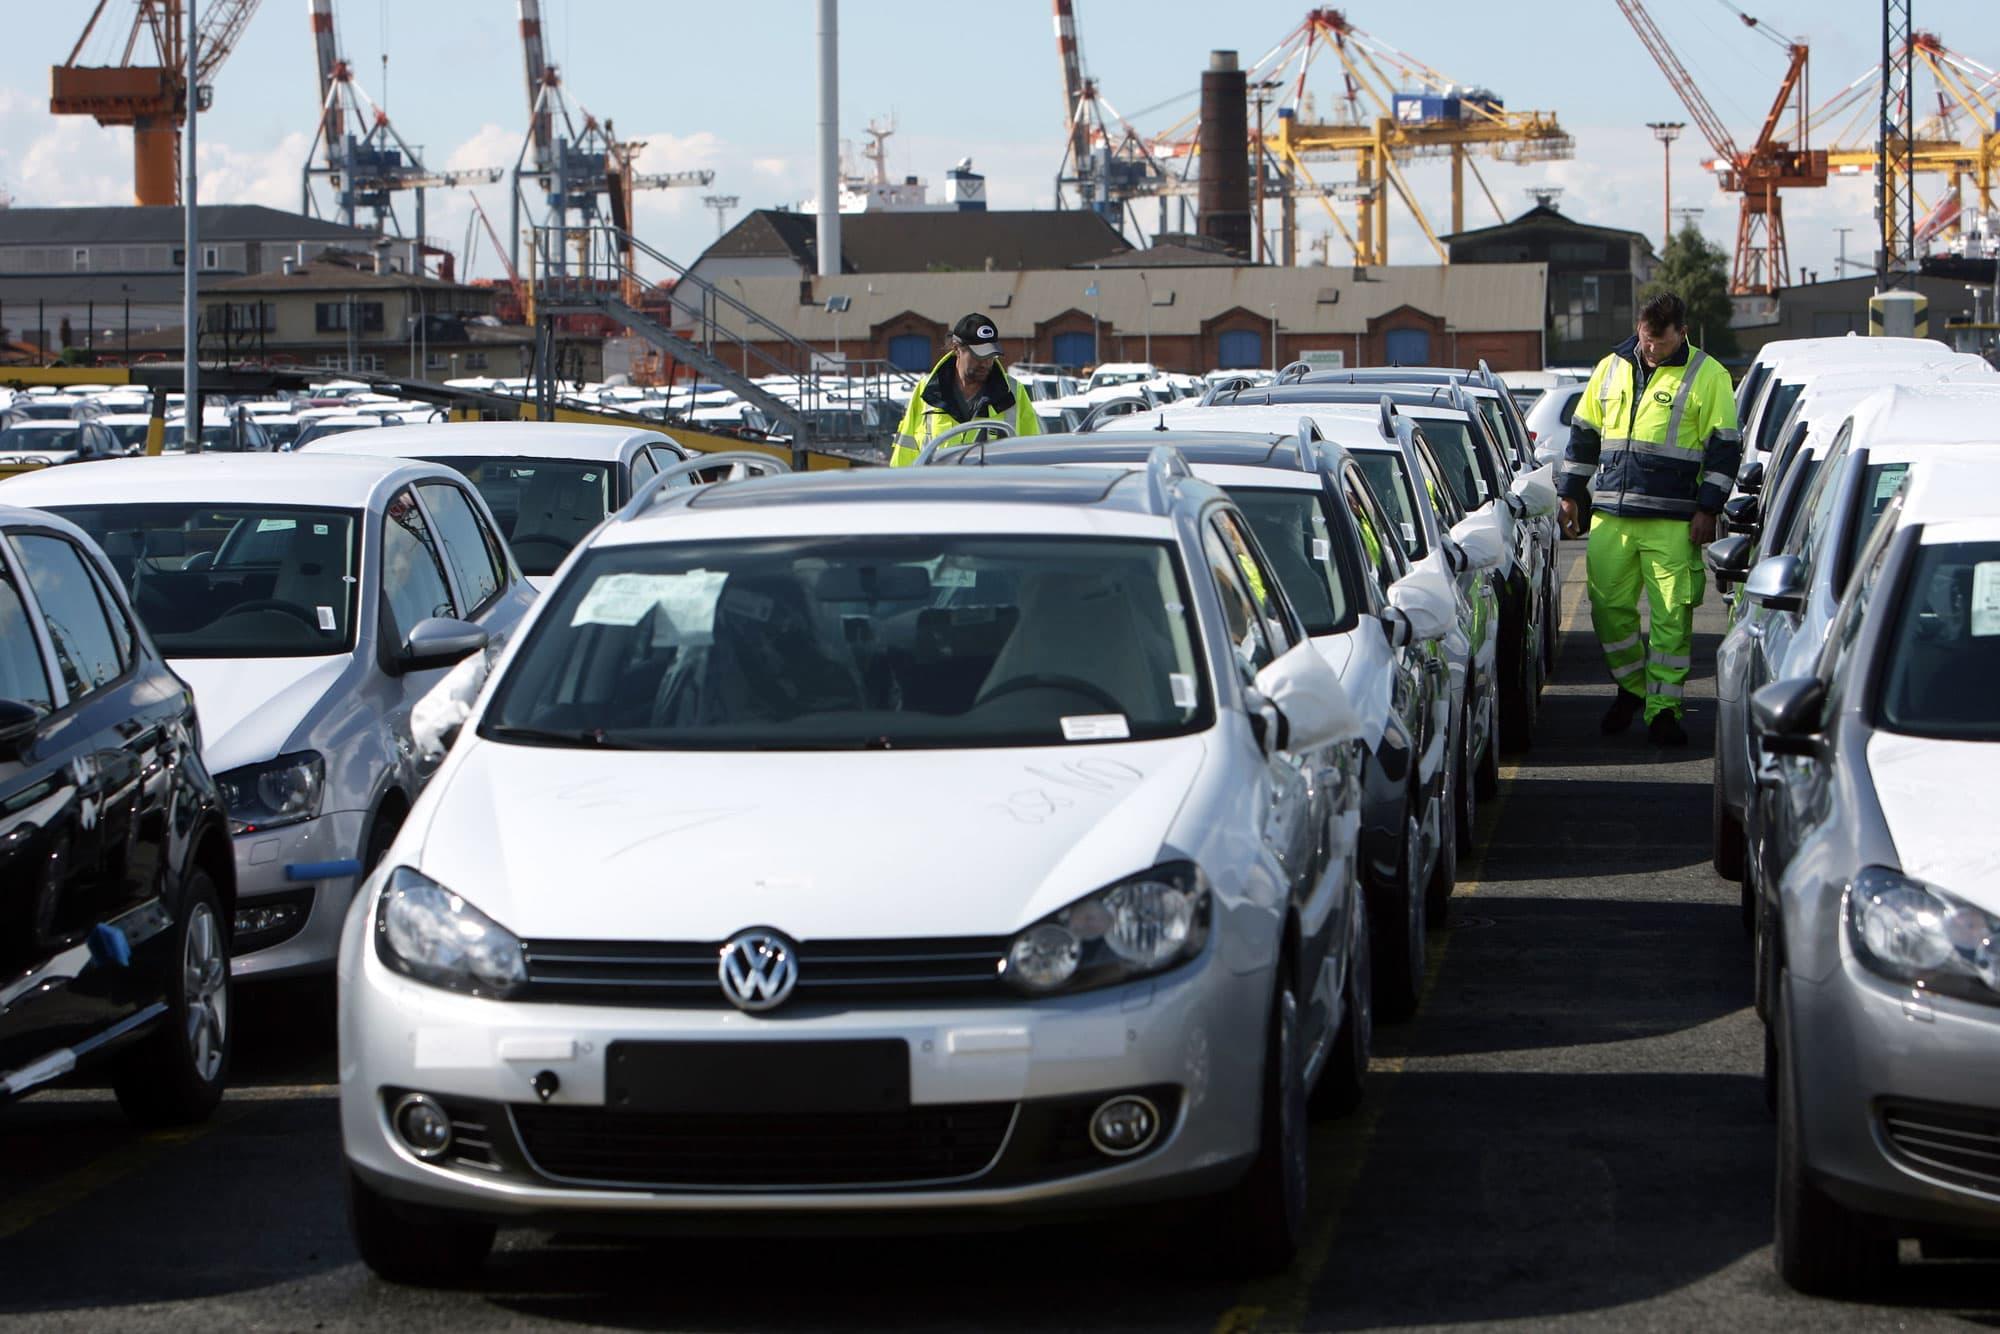 Volkswagen set to slash up to 4,000 jobs in digital transformation thumbnail